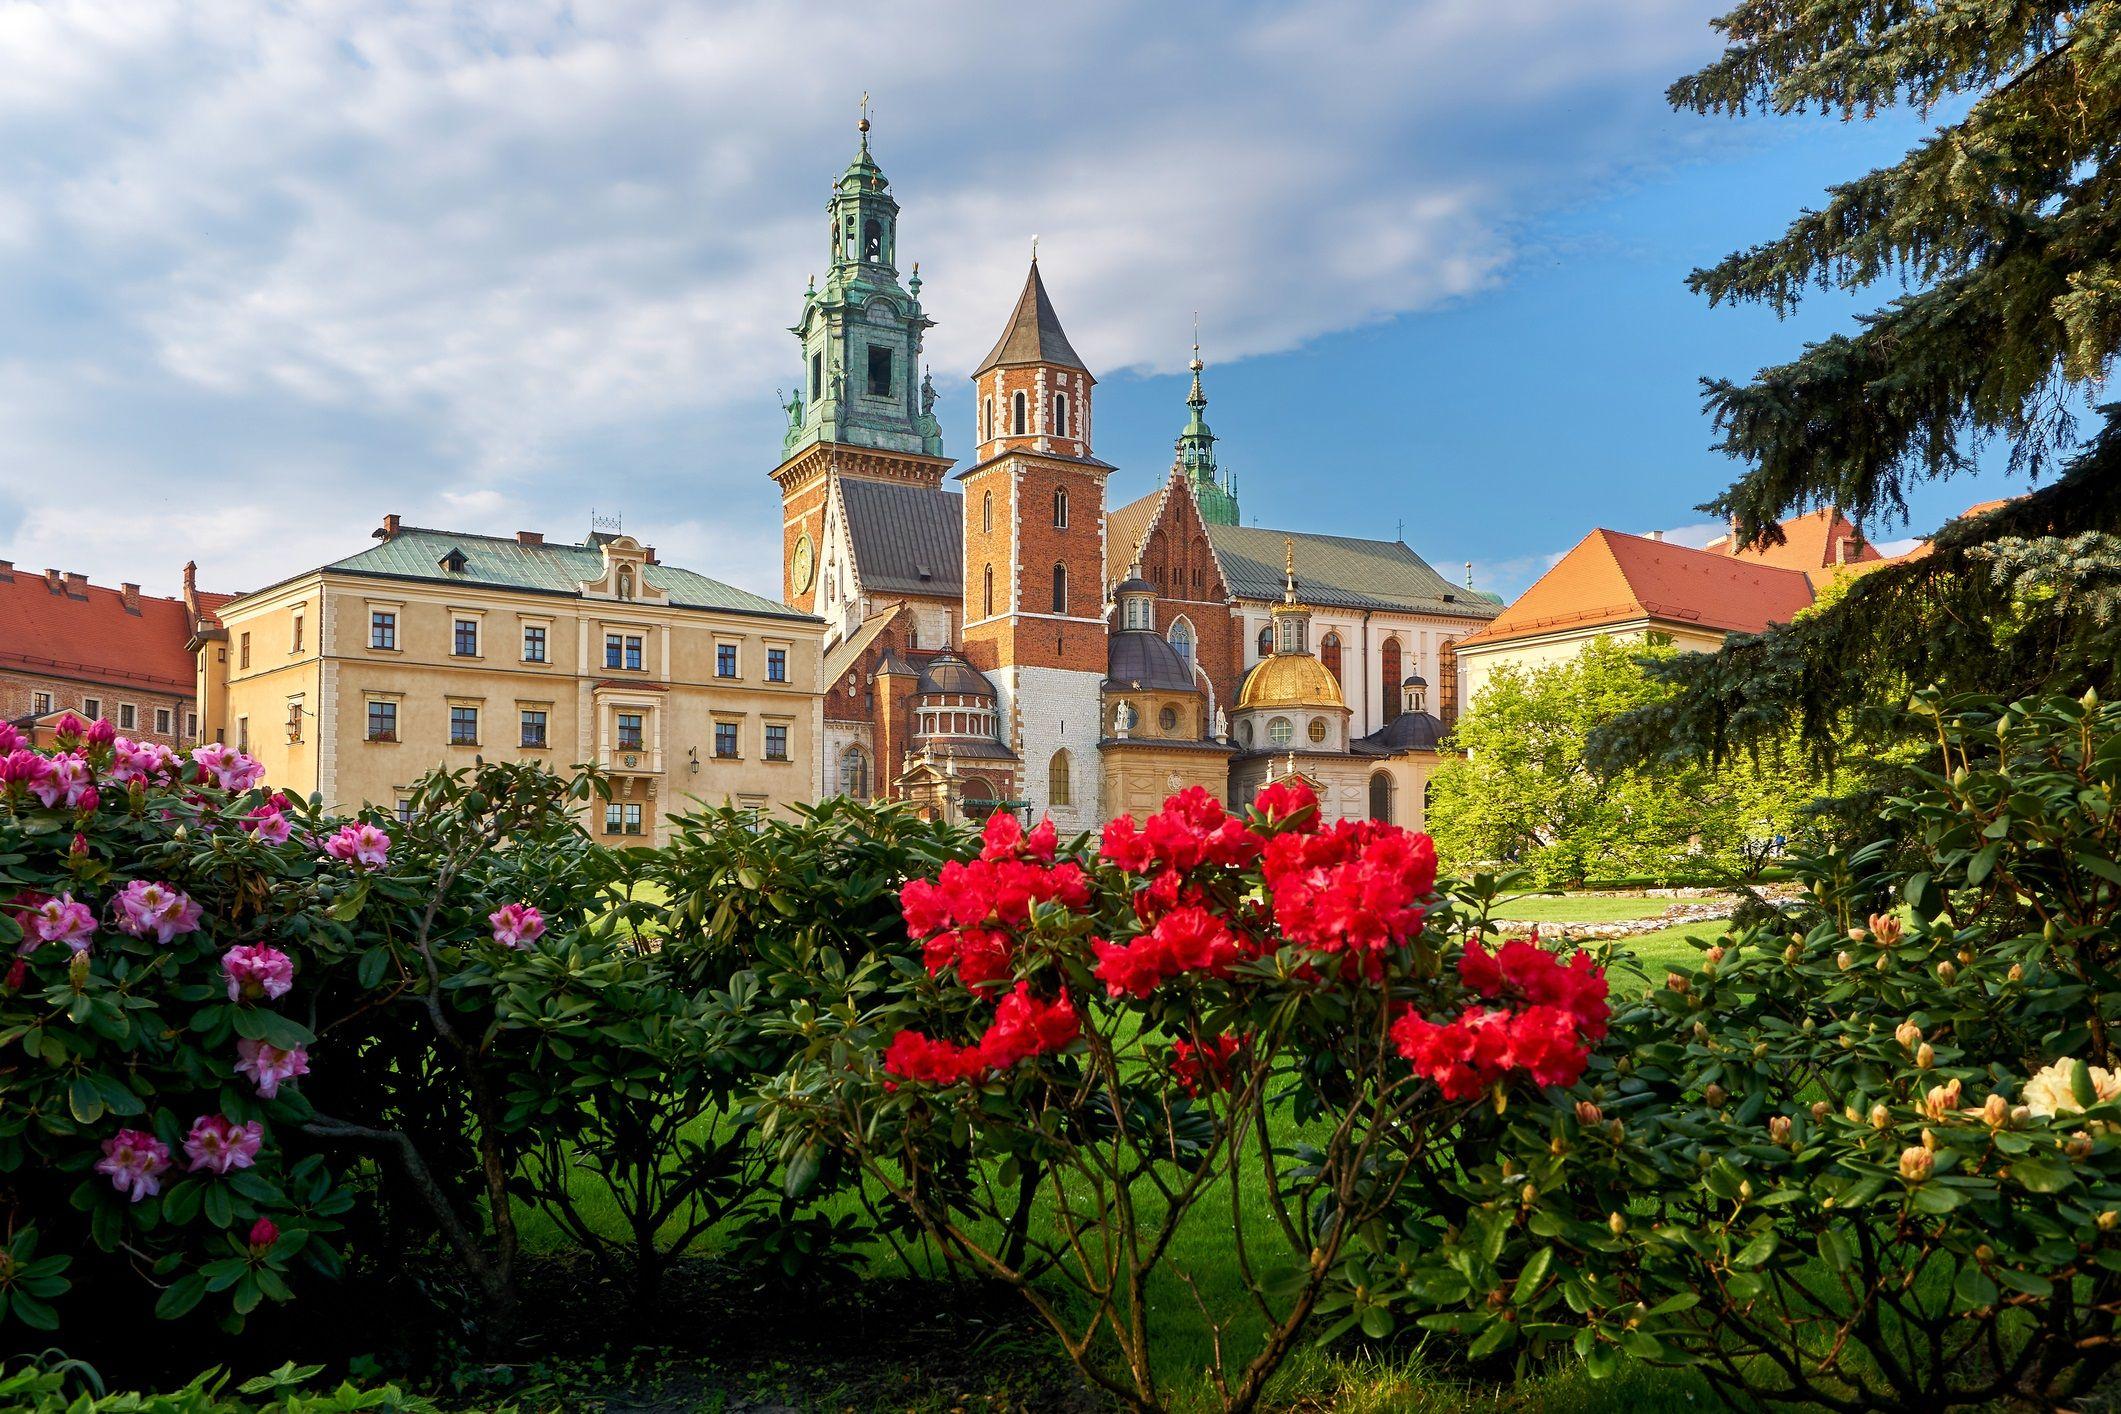 Le migliori città in Europa da visitare in un weekend